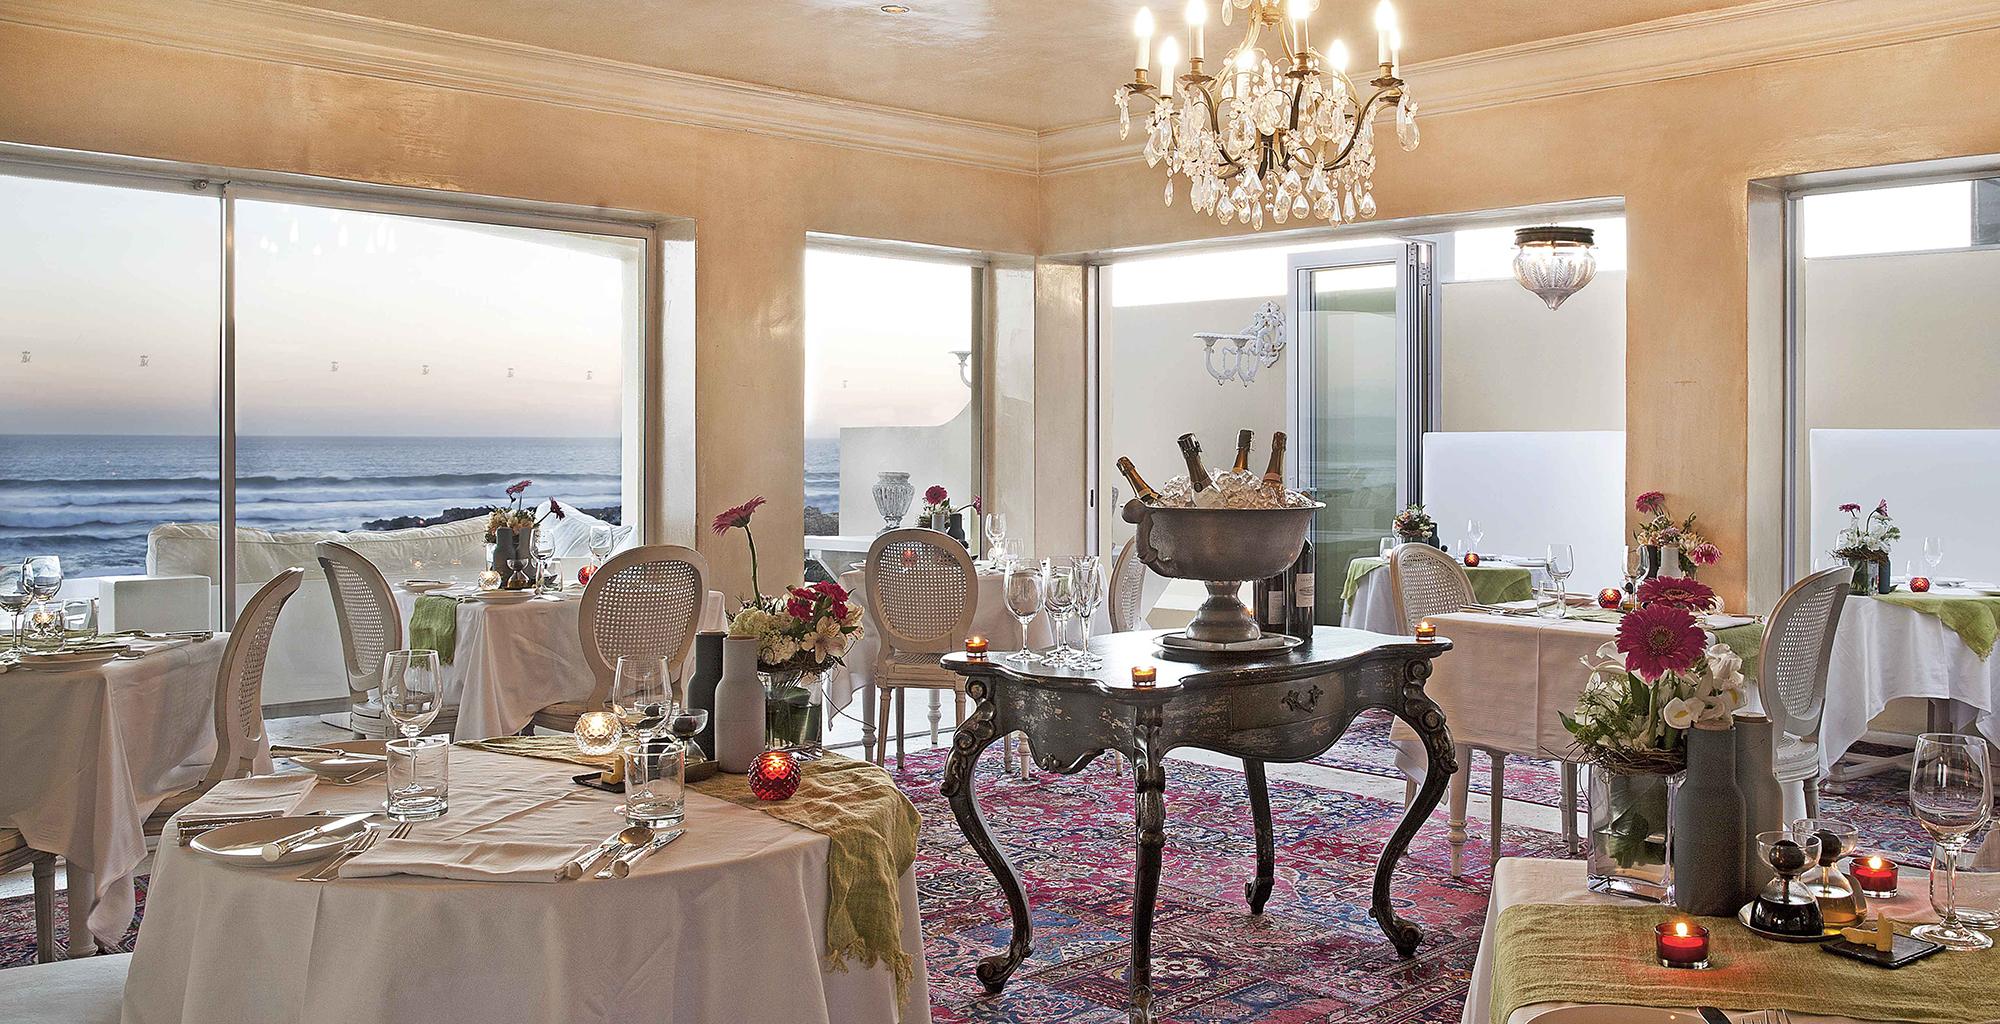 South-Africa-Birkenhead-House-Dining